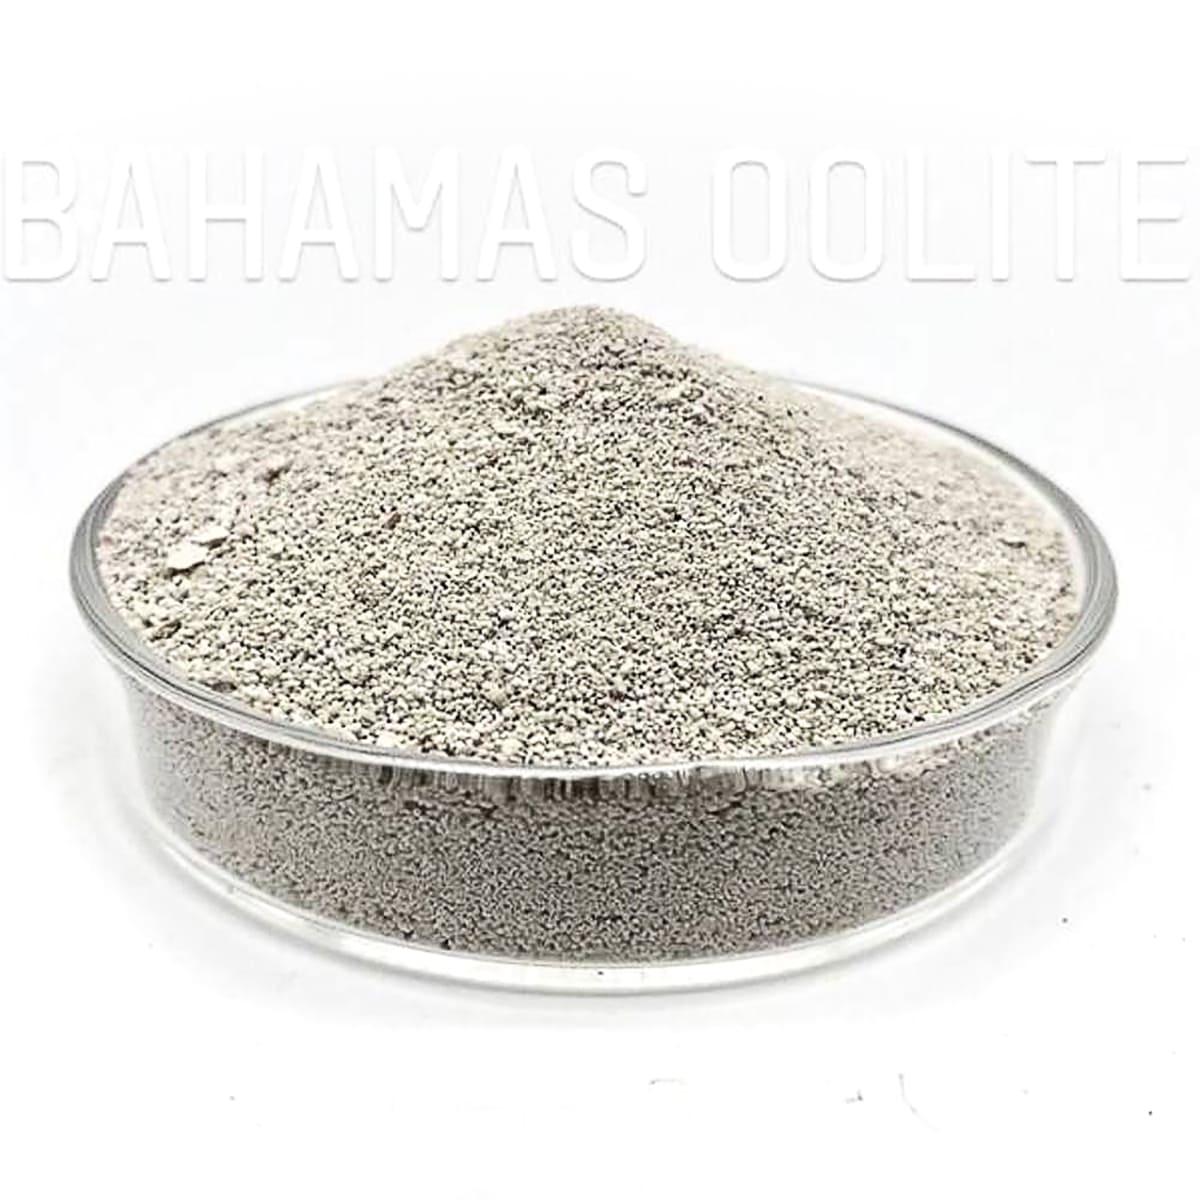 Substrato para Marinho e Ciclídeos Ocean Tech Oolite Sand 8kg